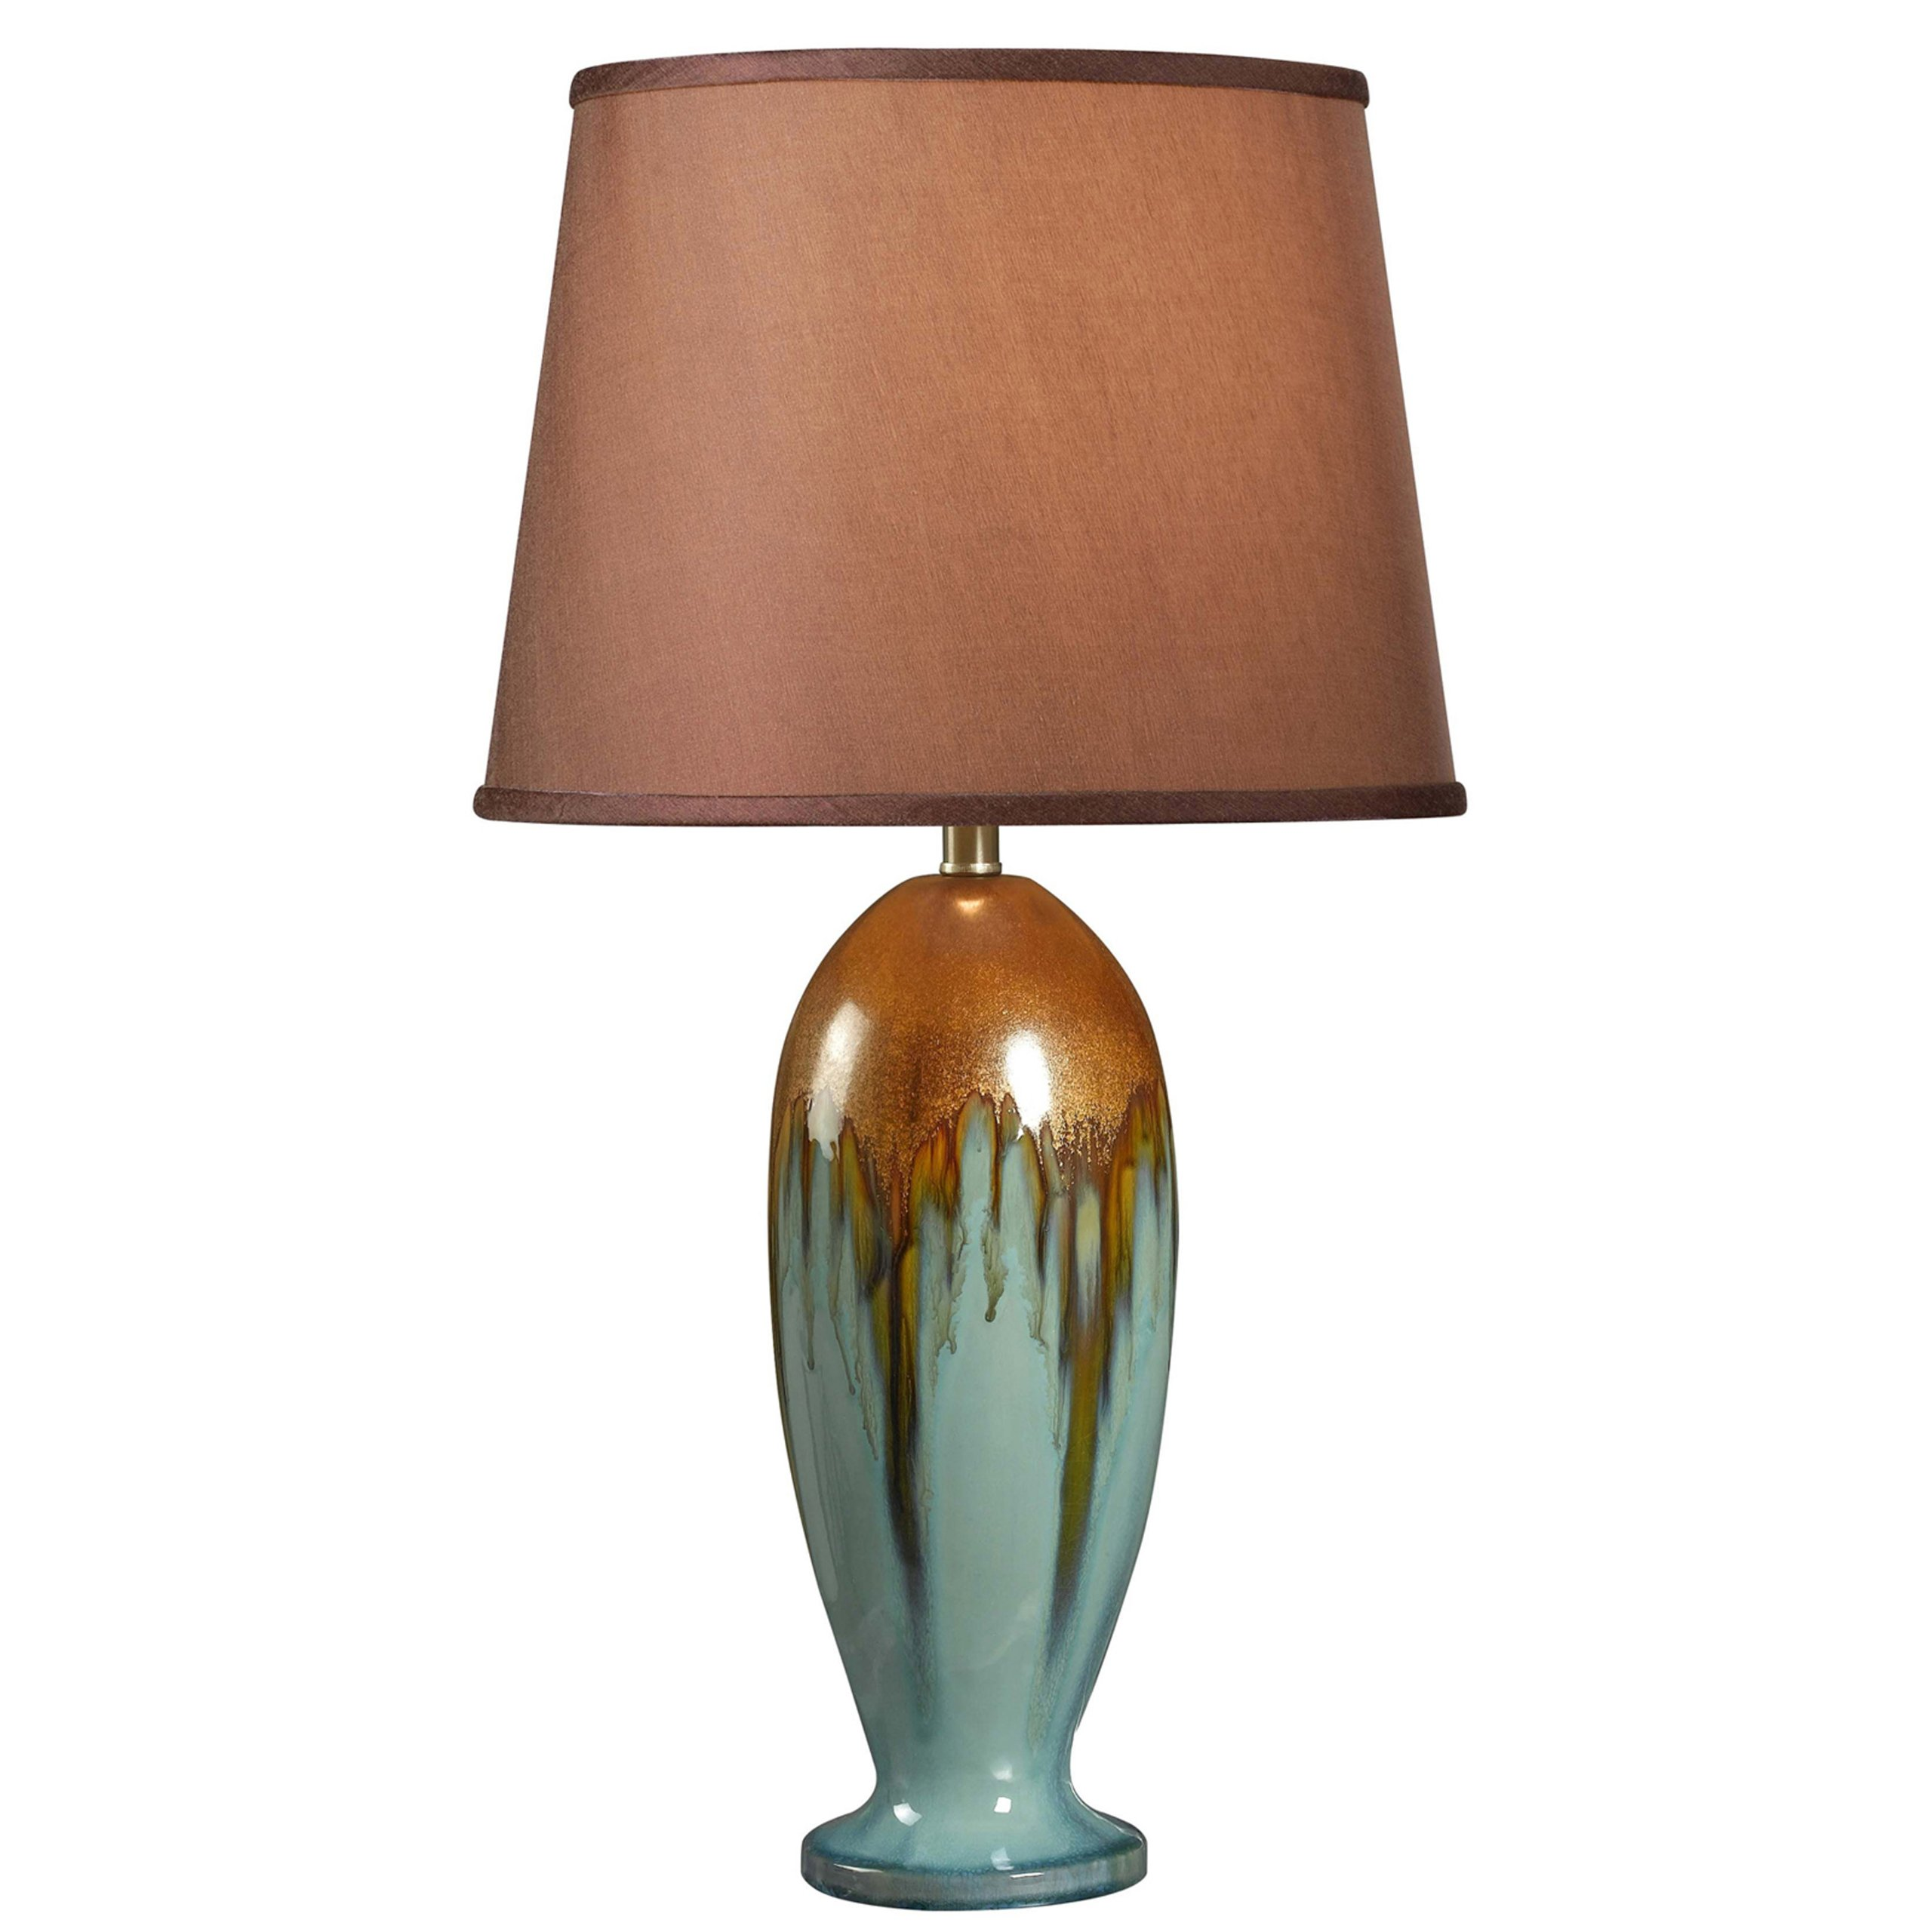 Kenroy Home 32366TEAL Tucson Table Lamp, 32'' x 15'' x 15''